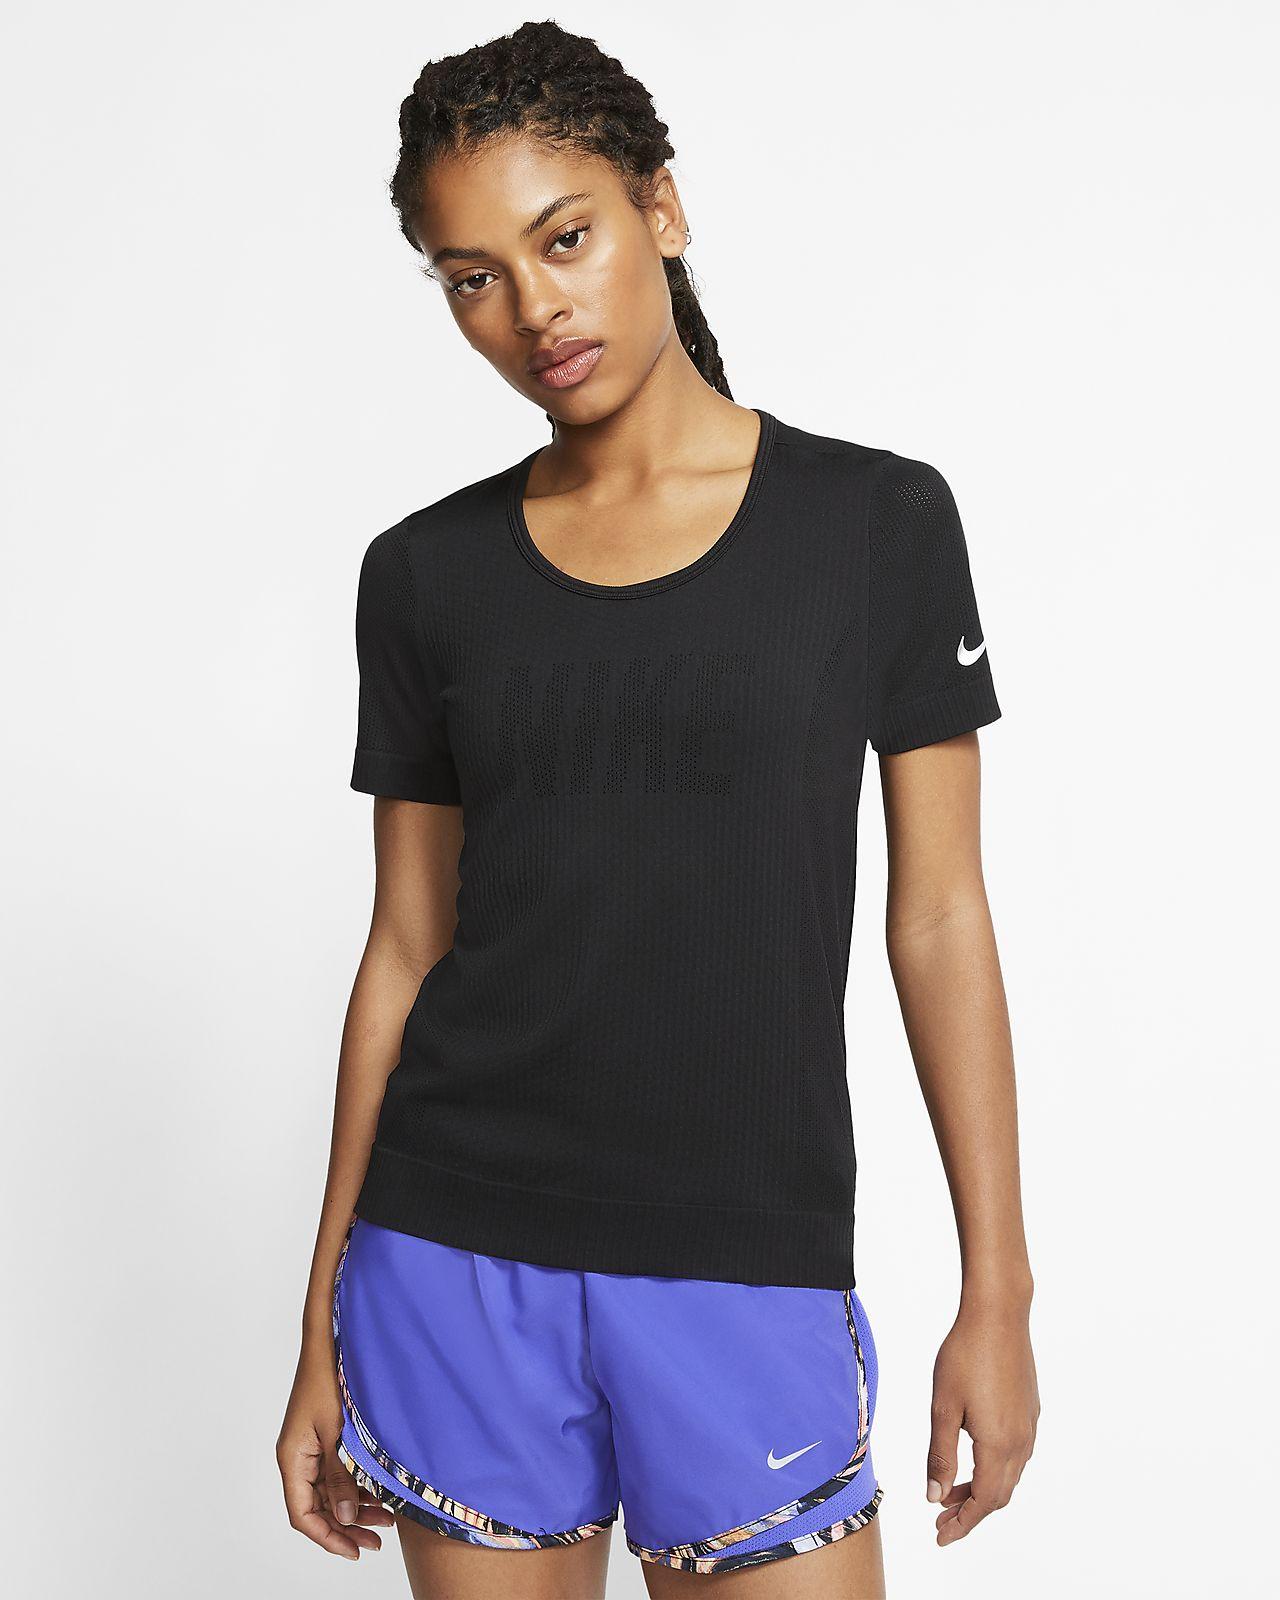 Nike Infinite løpeoverdel til dame